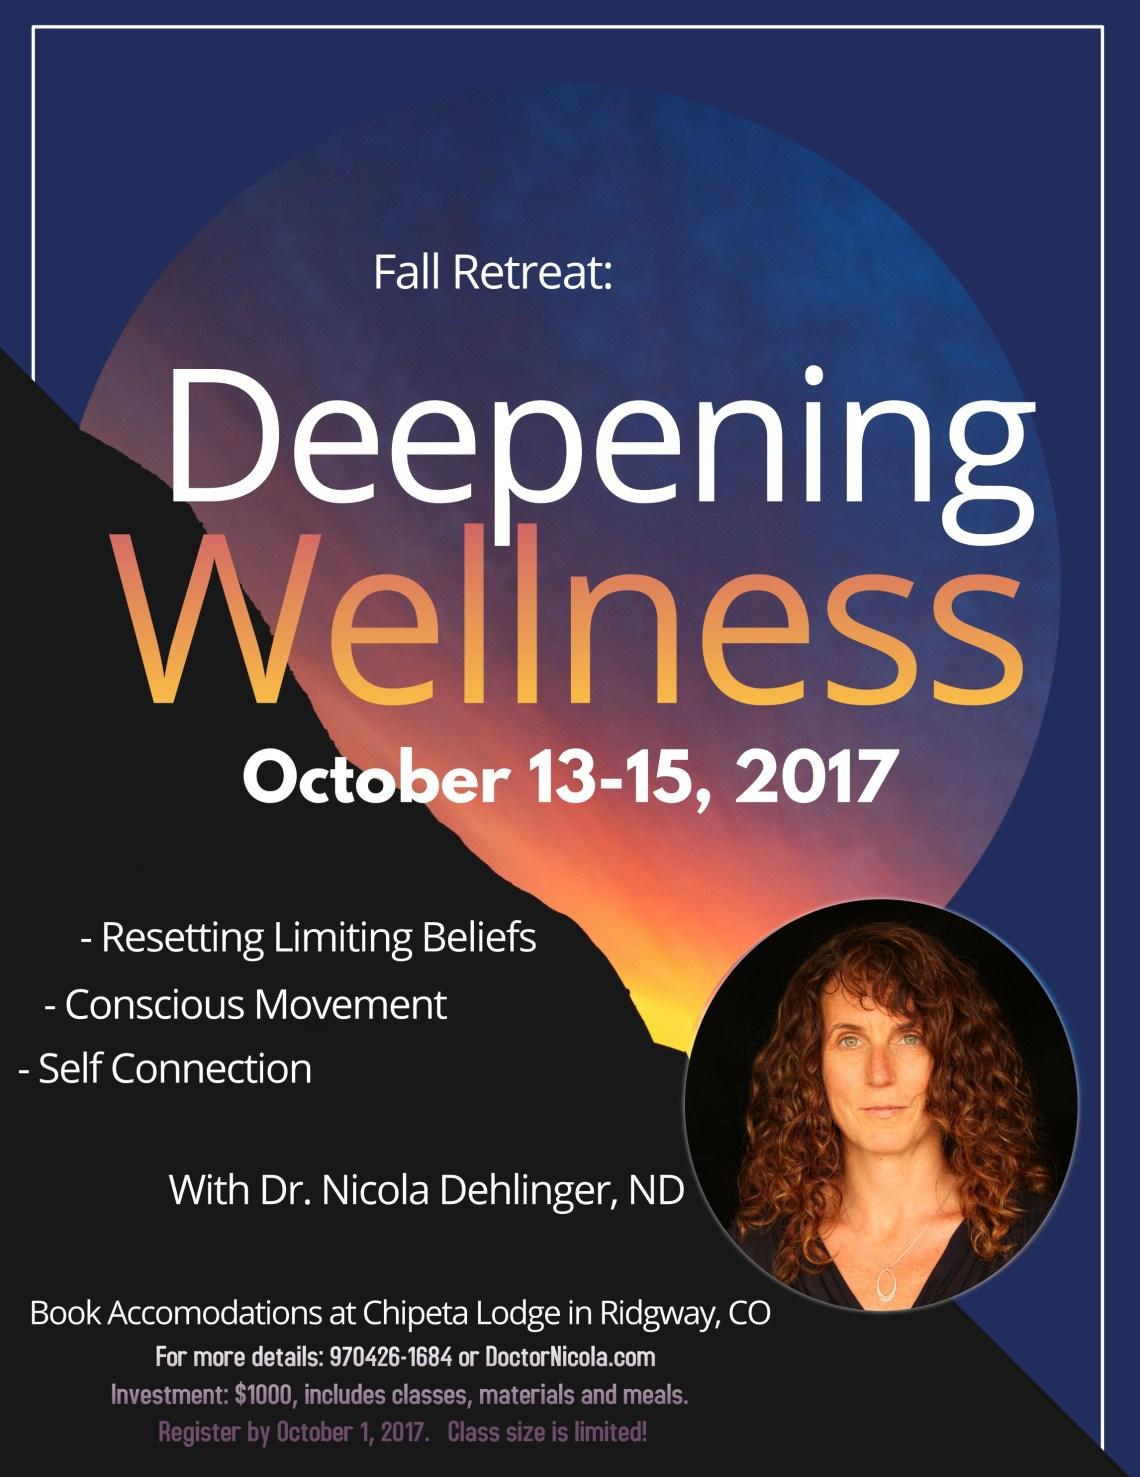 fall retreat2017